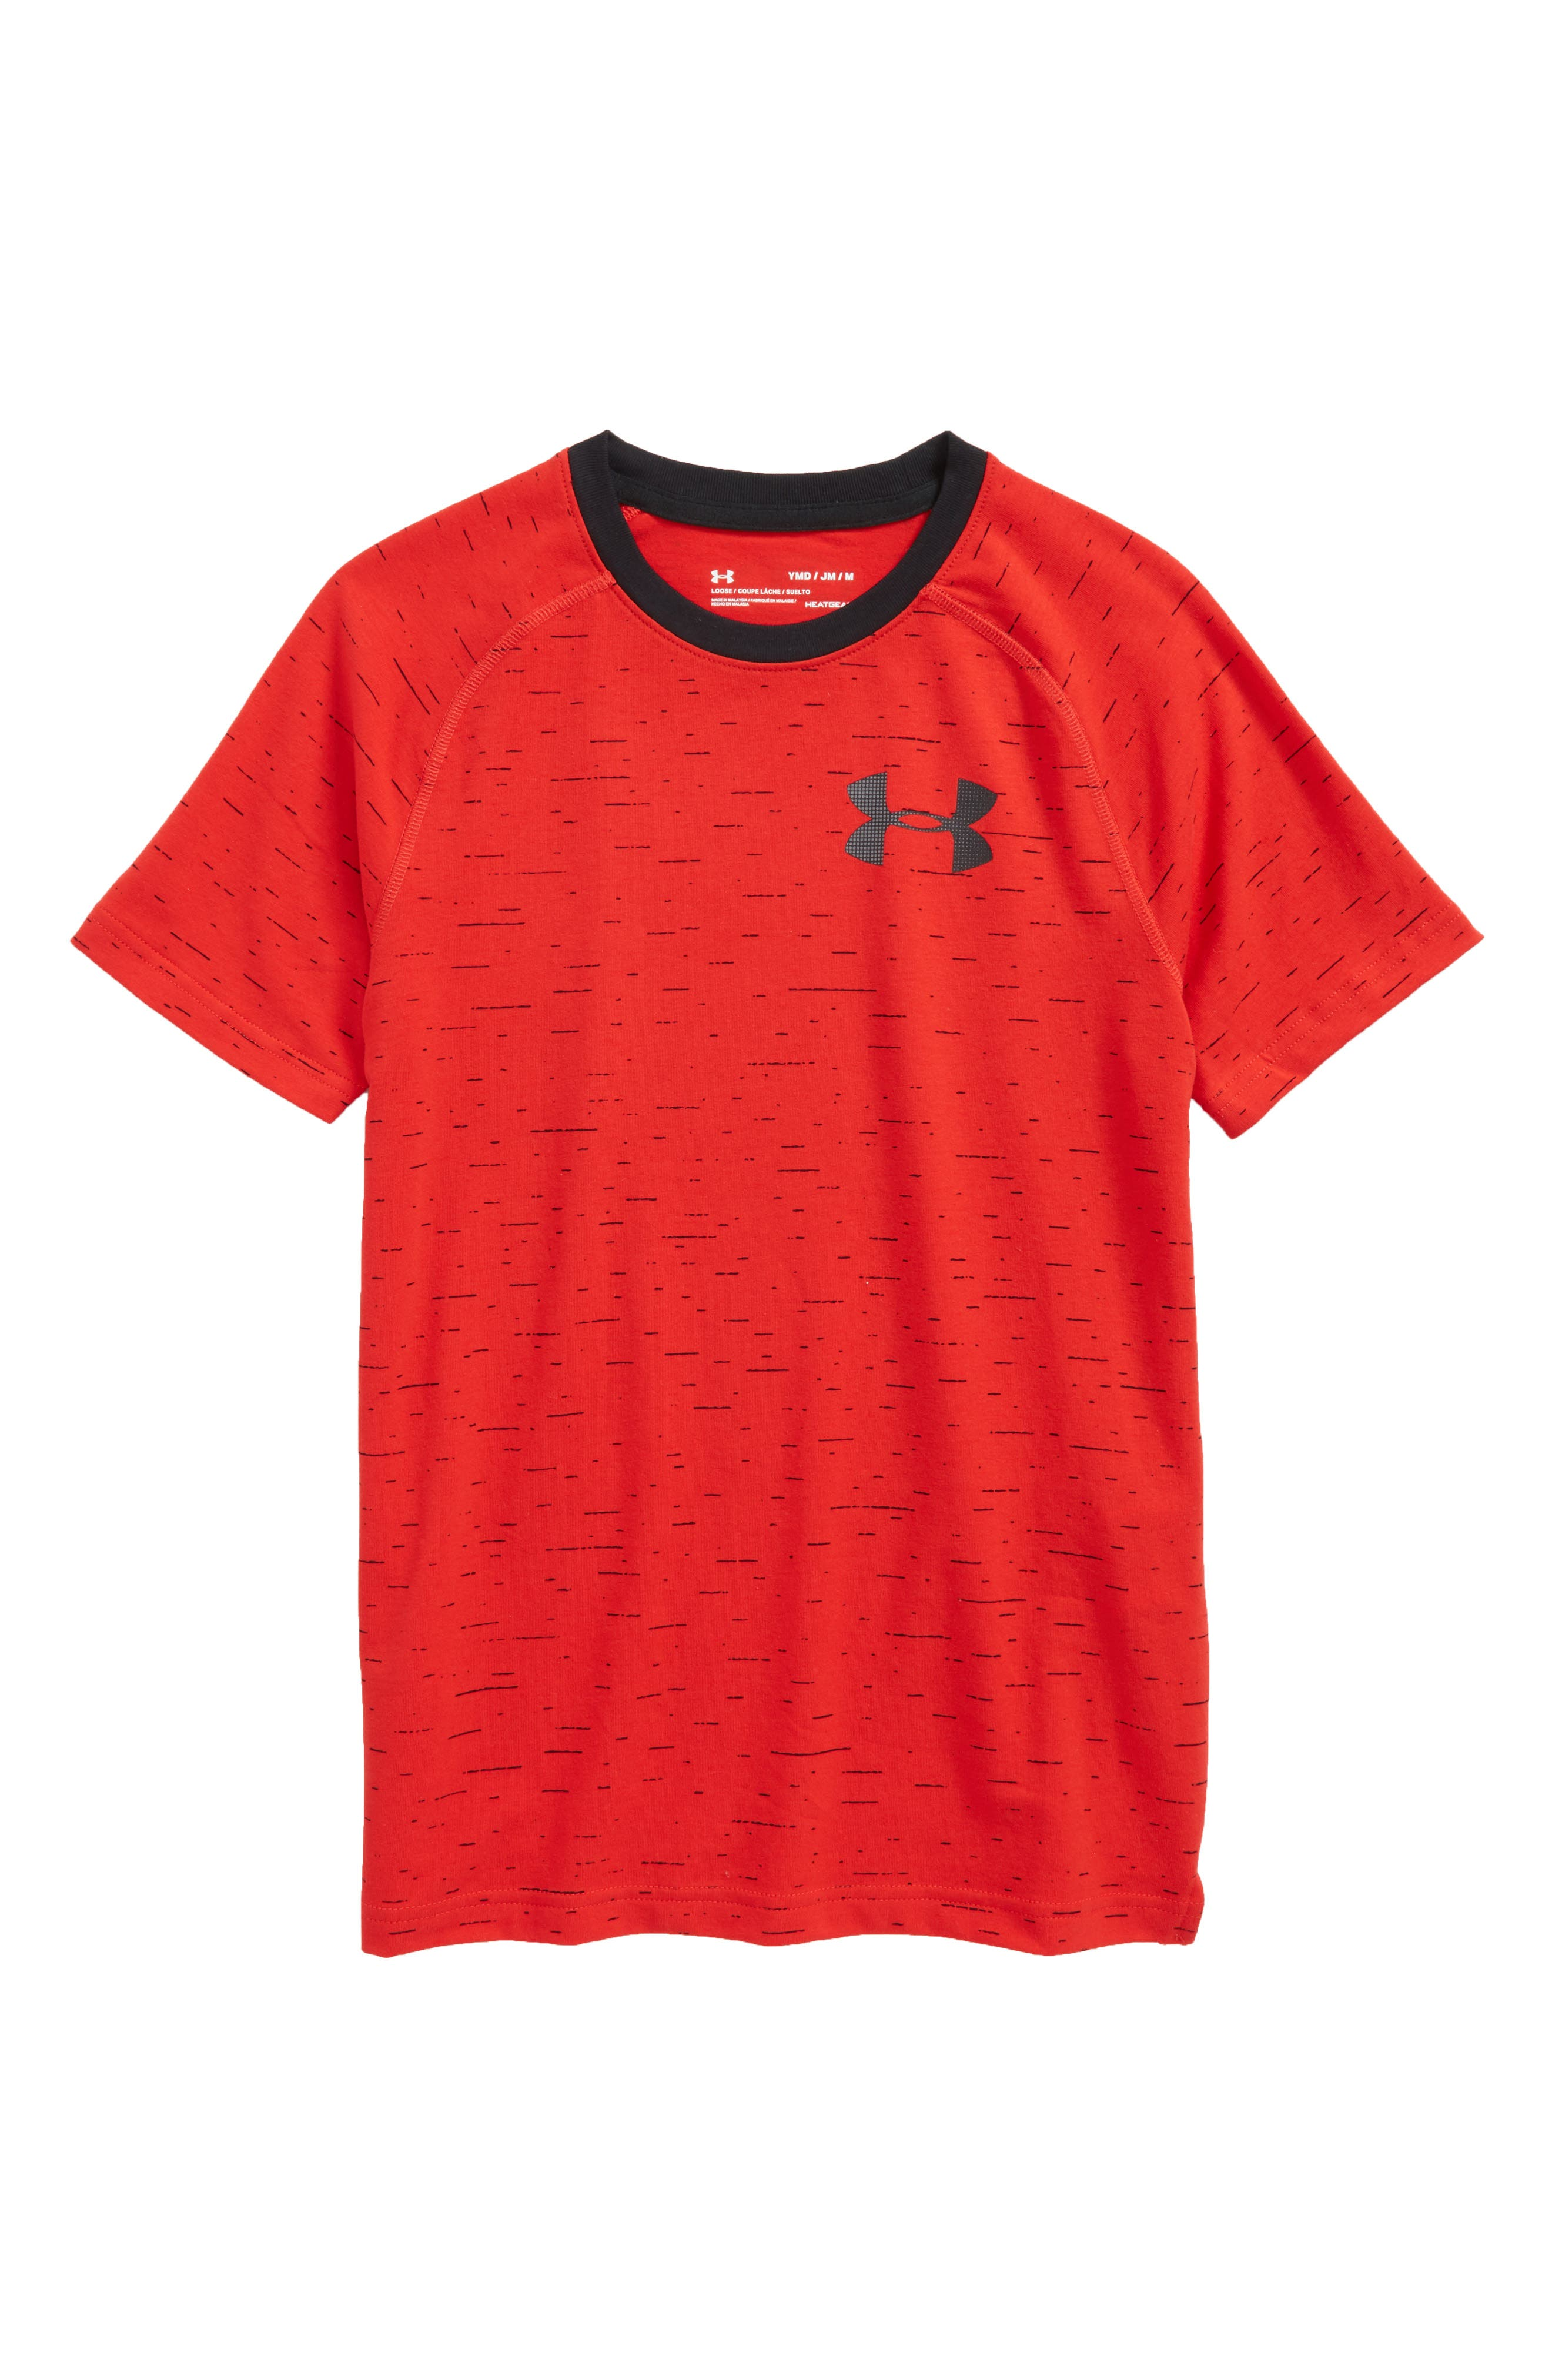 Under Armour Knit T-Shirt (Big Boys)